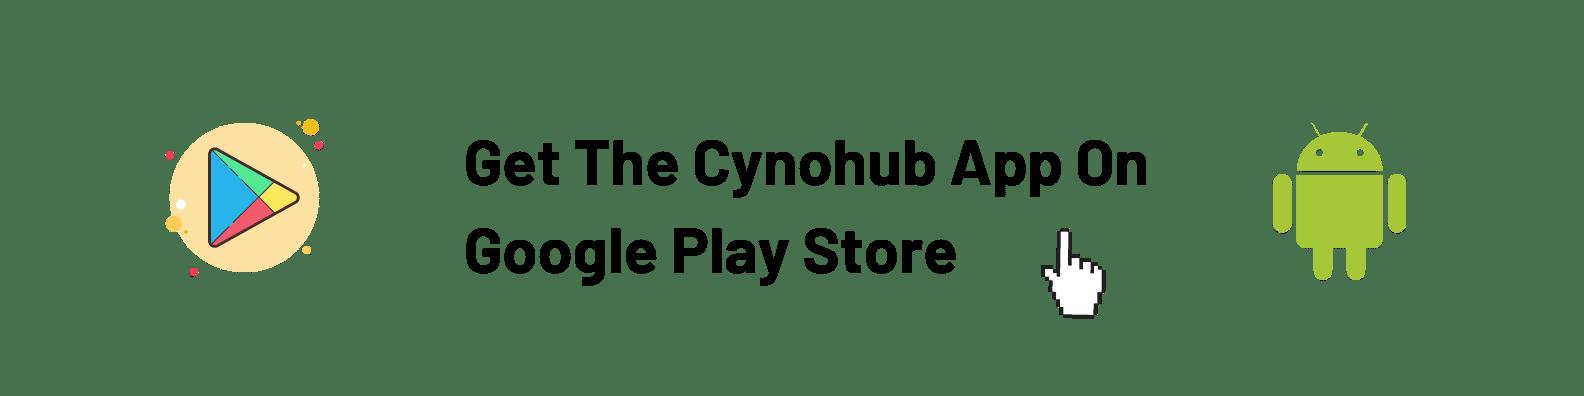 learn engineering mathematics 2 M2 cynohub btech